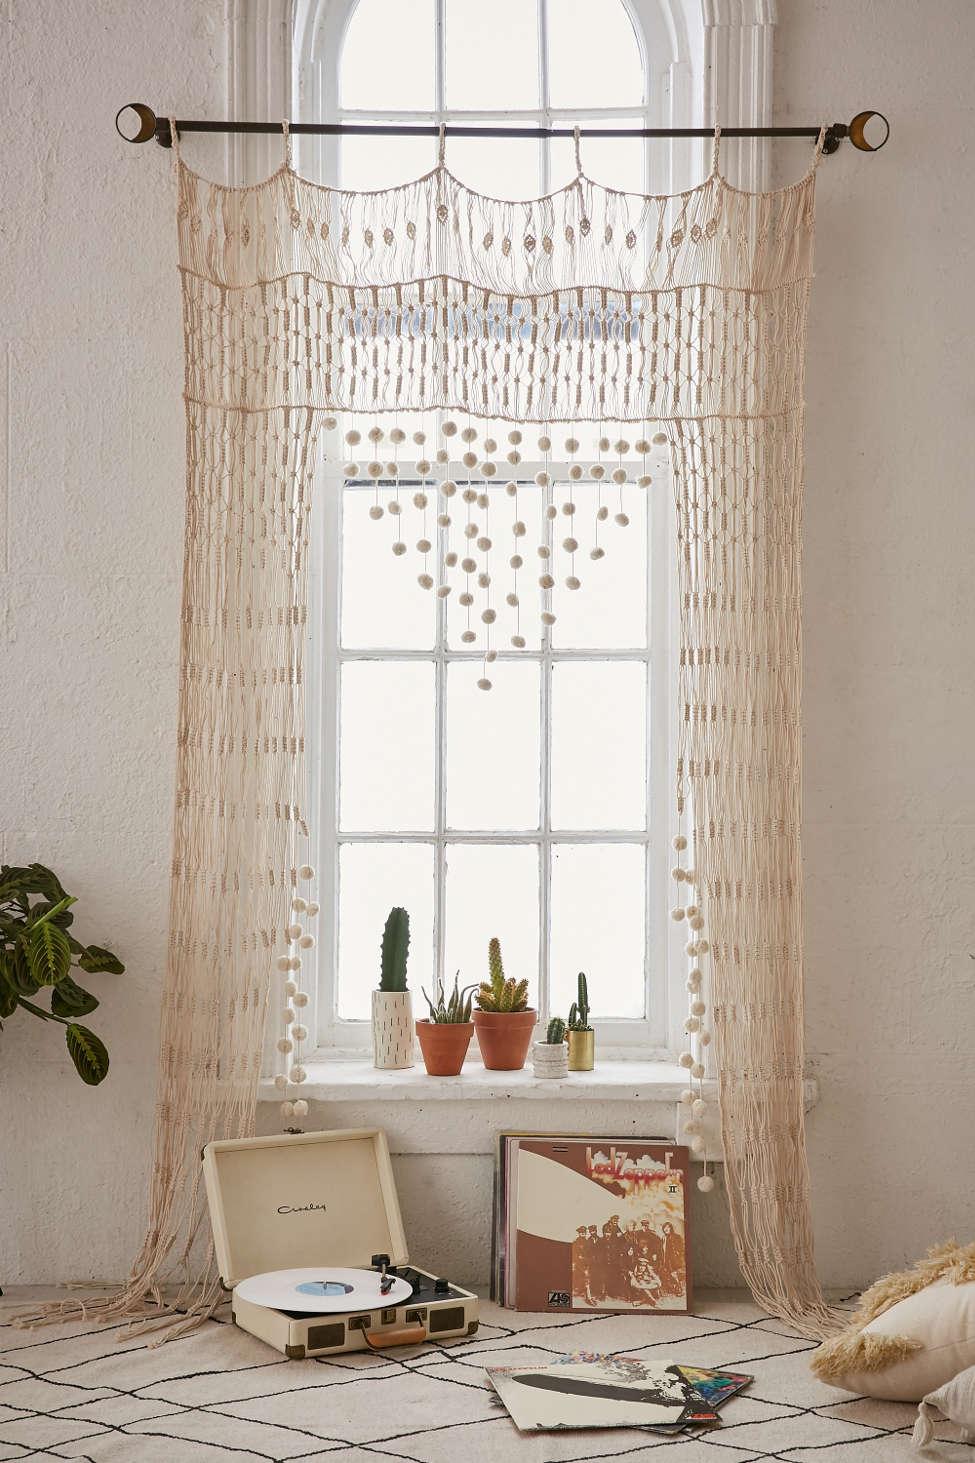 Slide View: 1: Crochet Portal